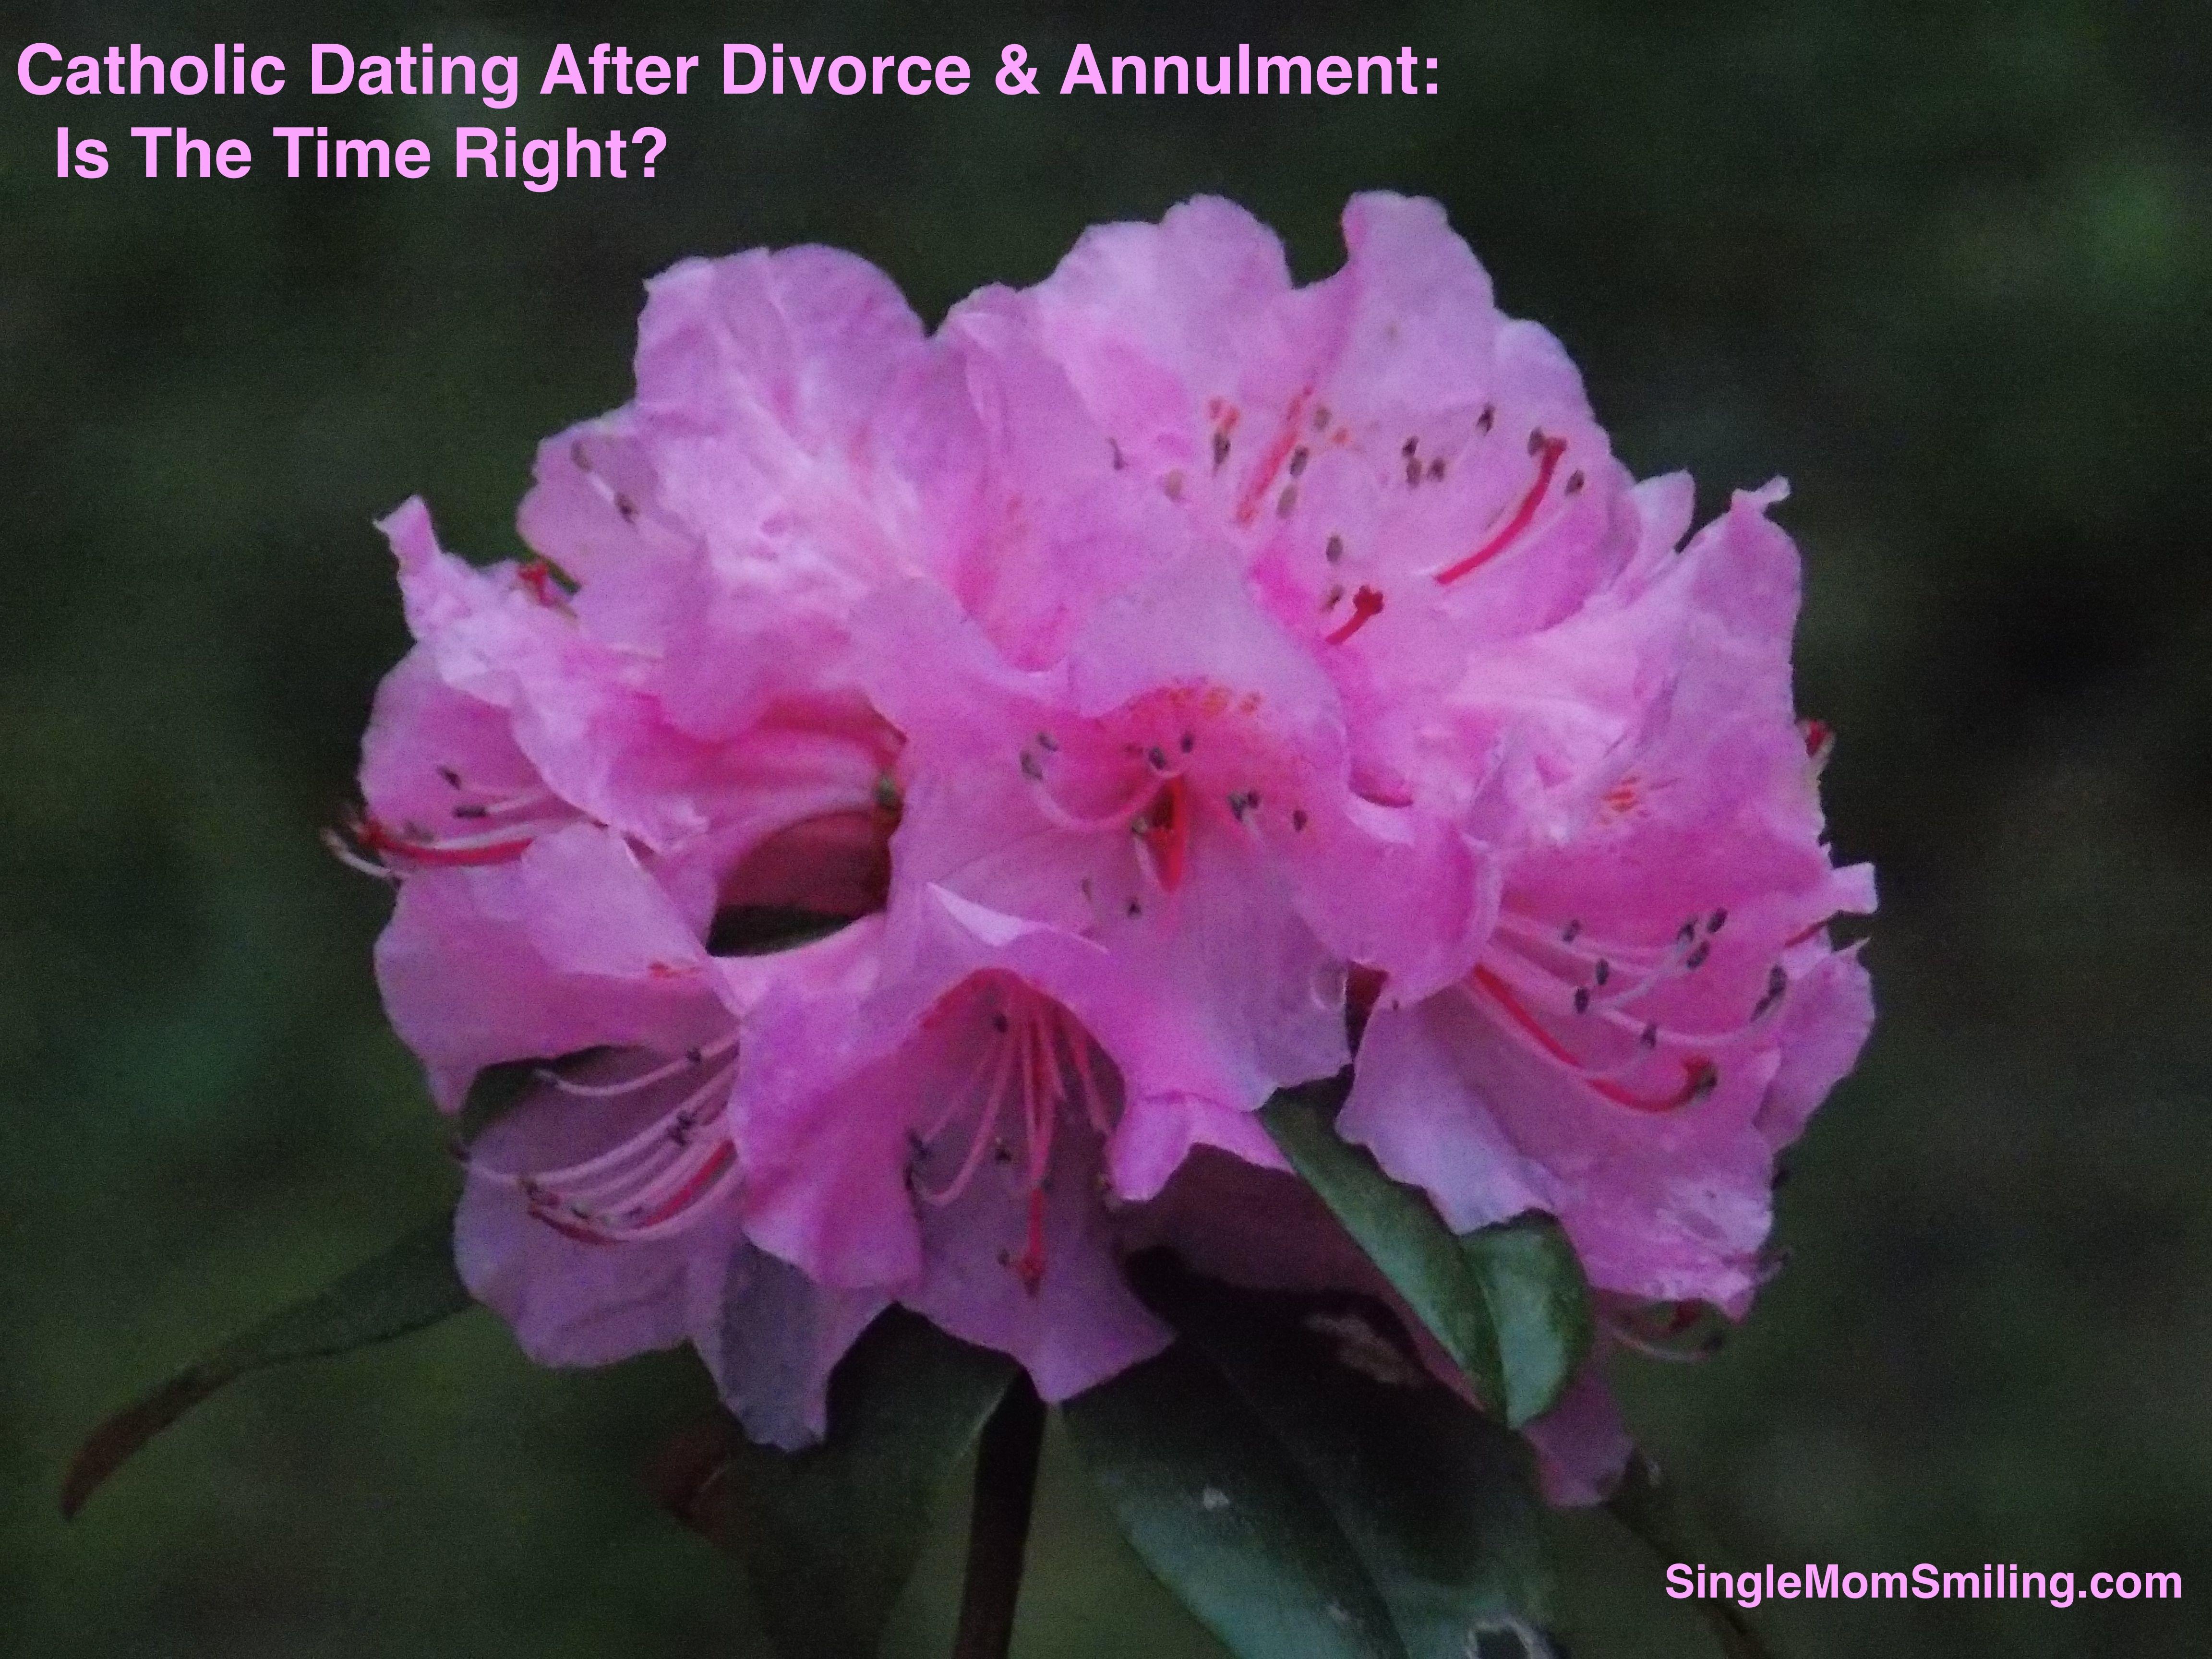 Catholic divorced singles